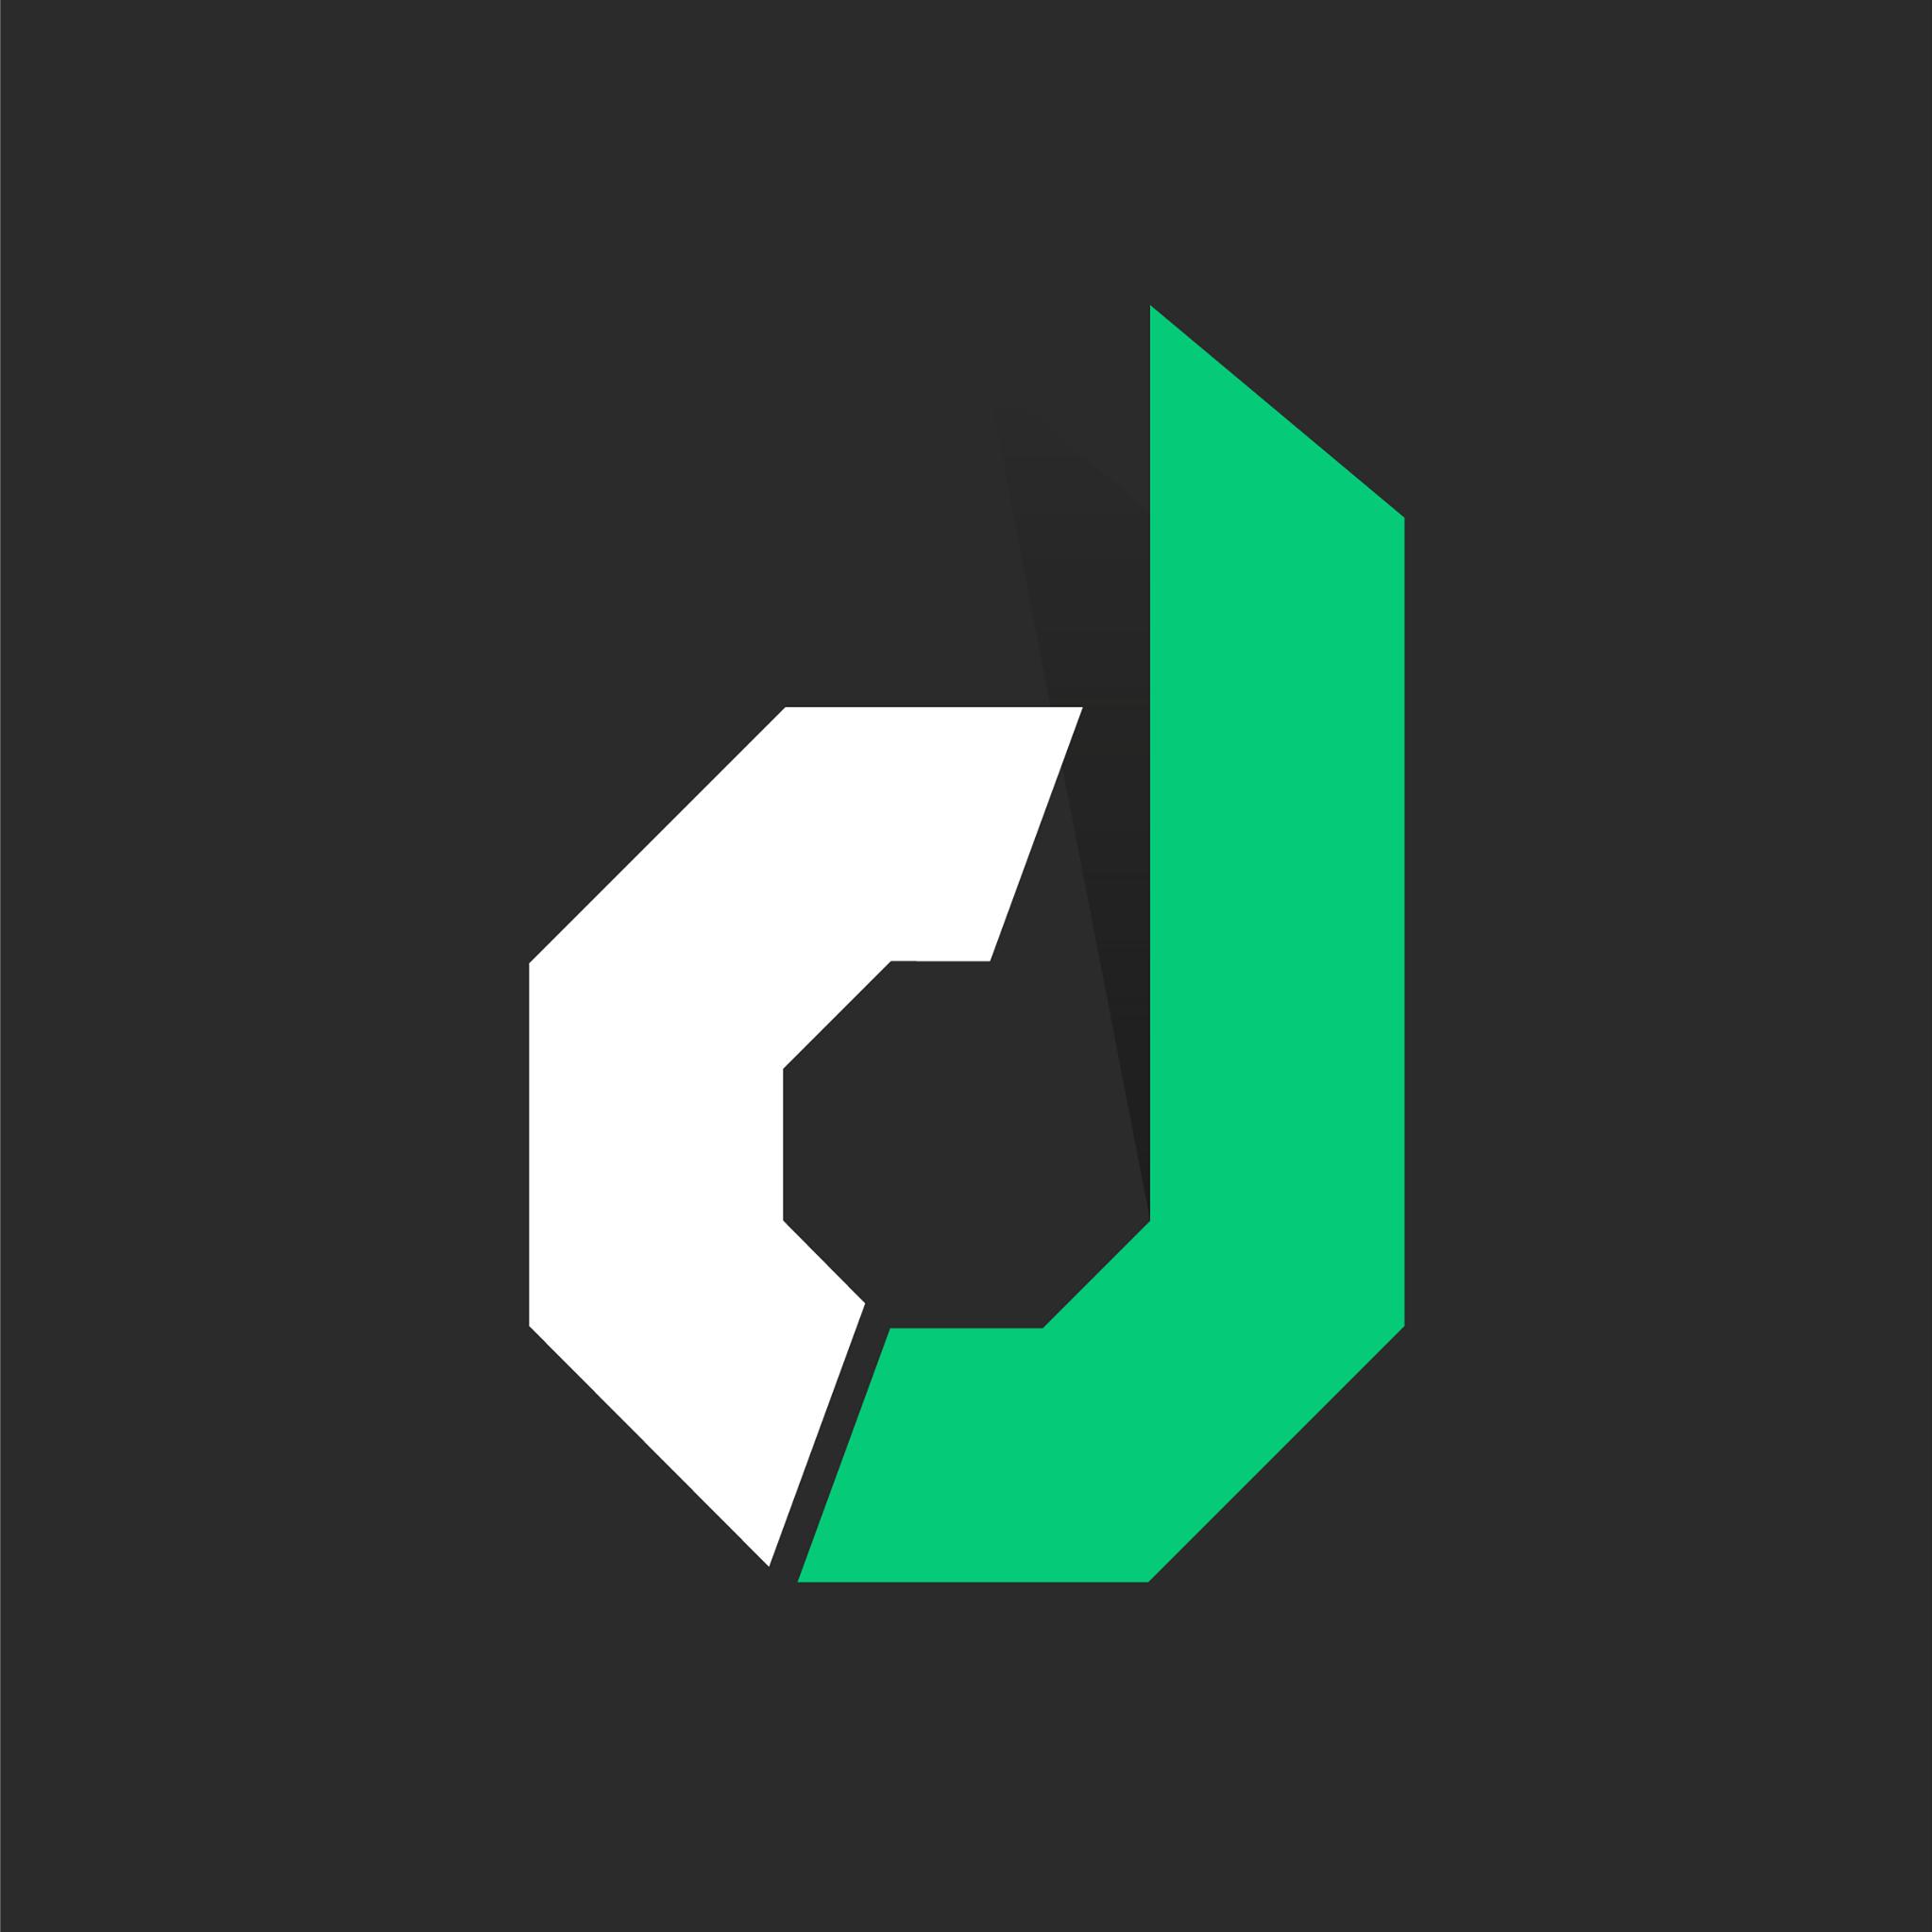 Device Magic logo